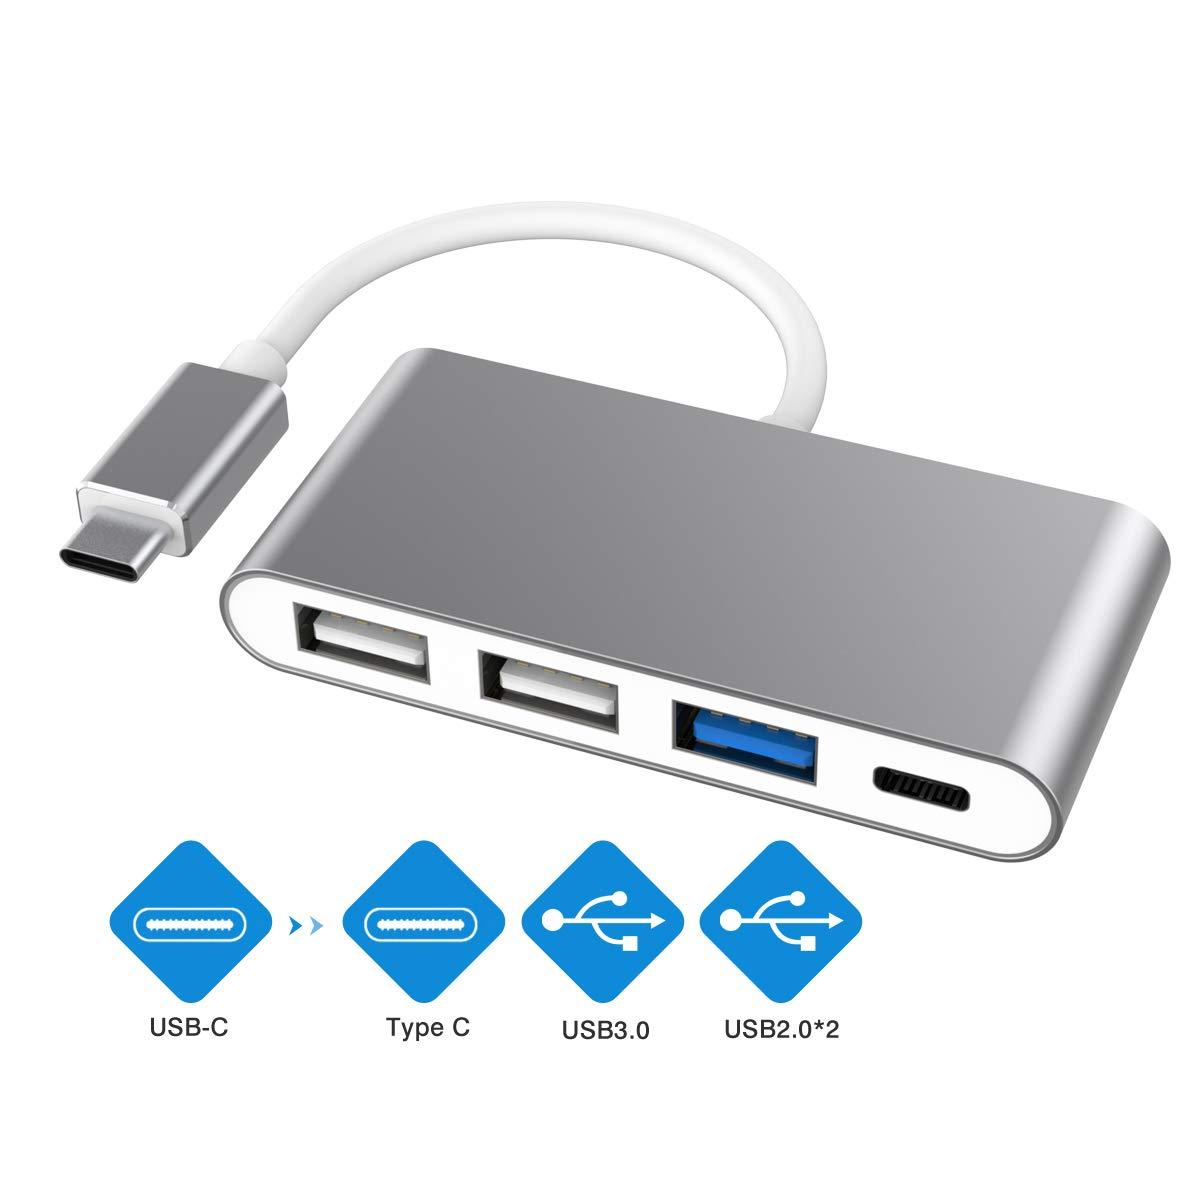 USB C Hub, USB Type C to USB3.0 Adapter, Type C Hub USB3.0 & 2USB2.0 & Type C Female Charging Port, Multi-Port USB C to USB OTG Data Adapter for ChromeBook Pixel/Dell XPS and More